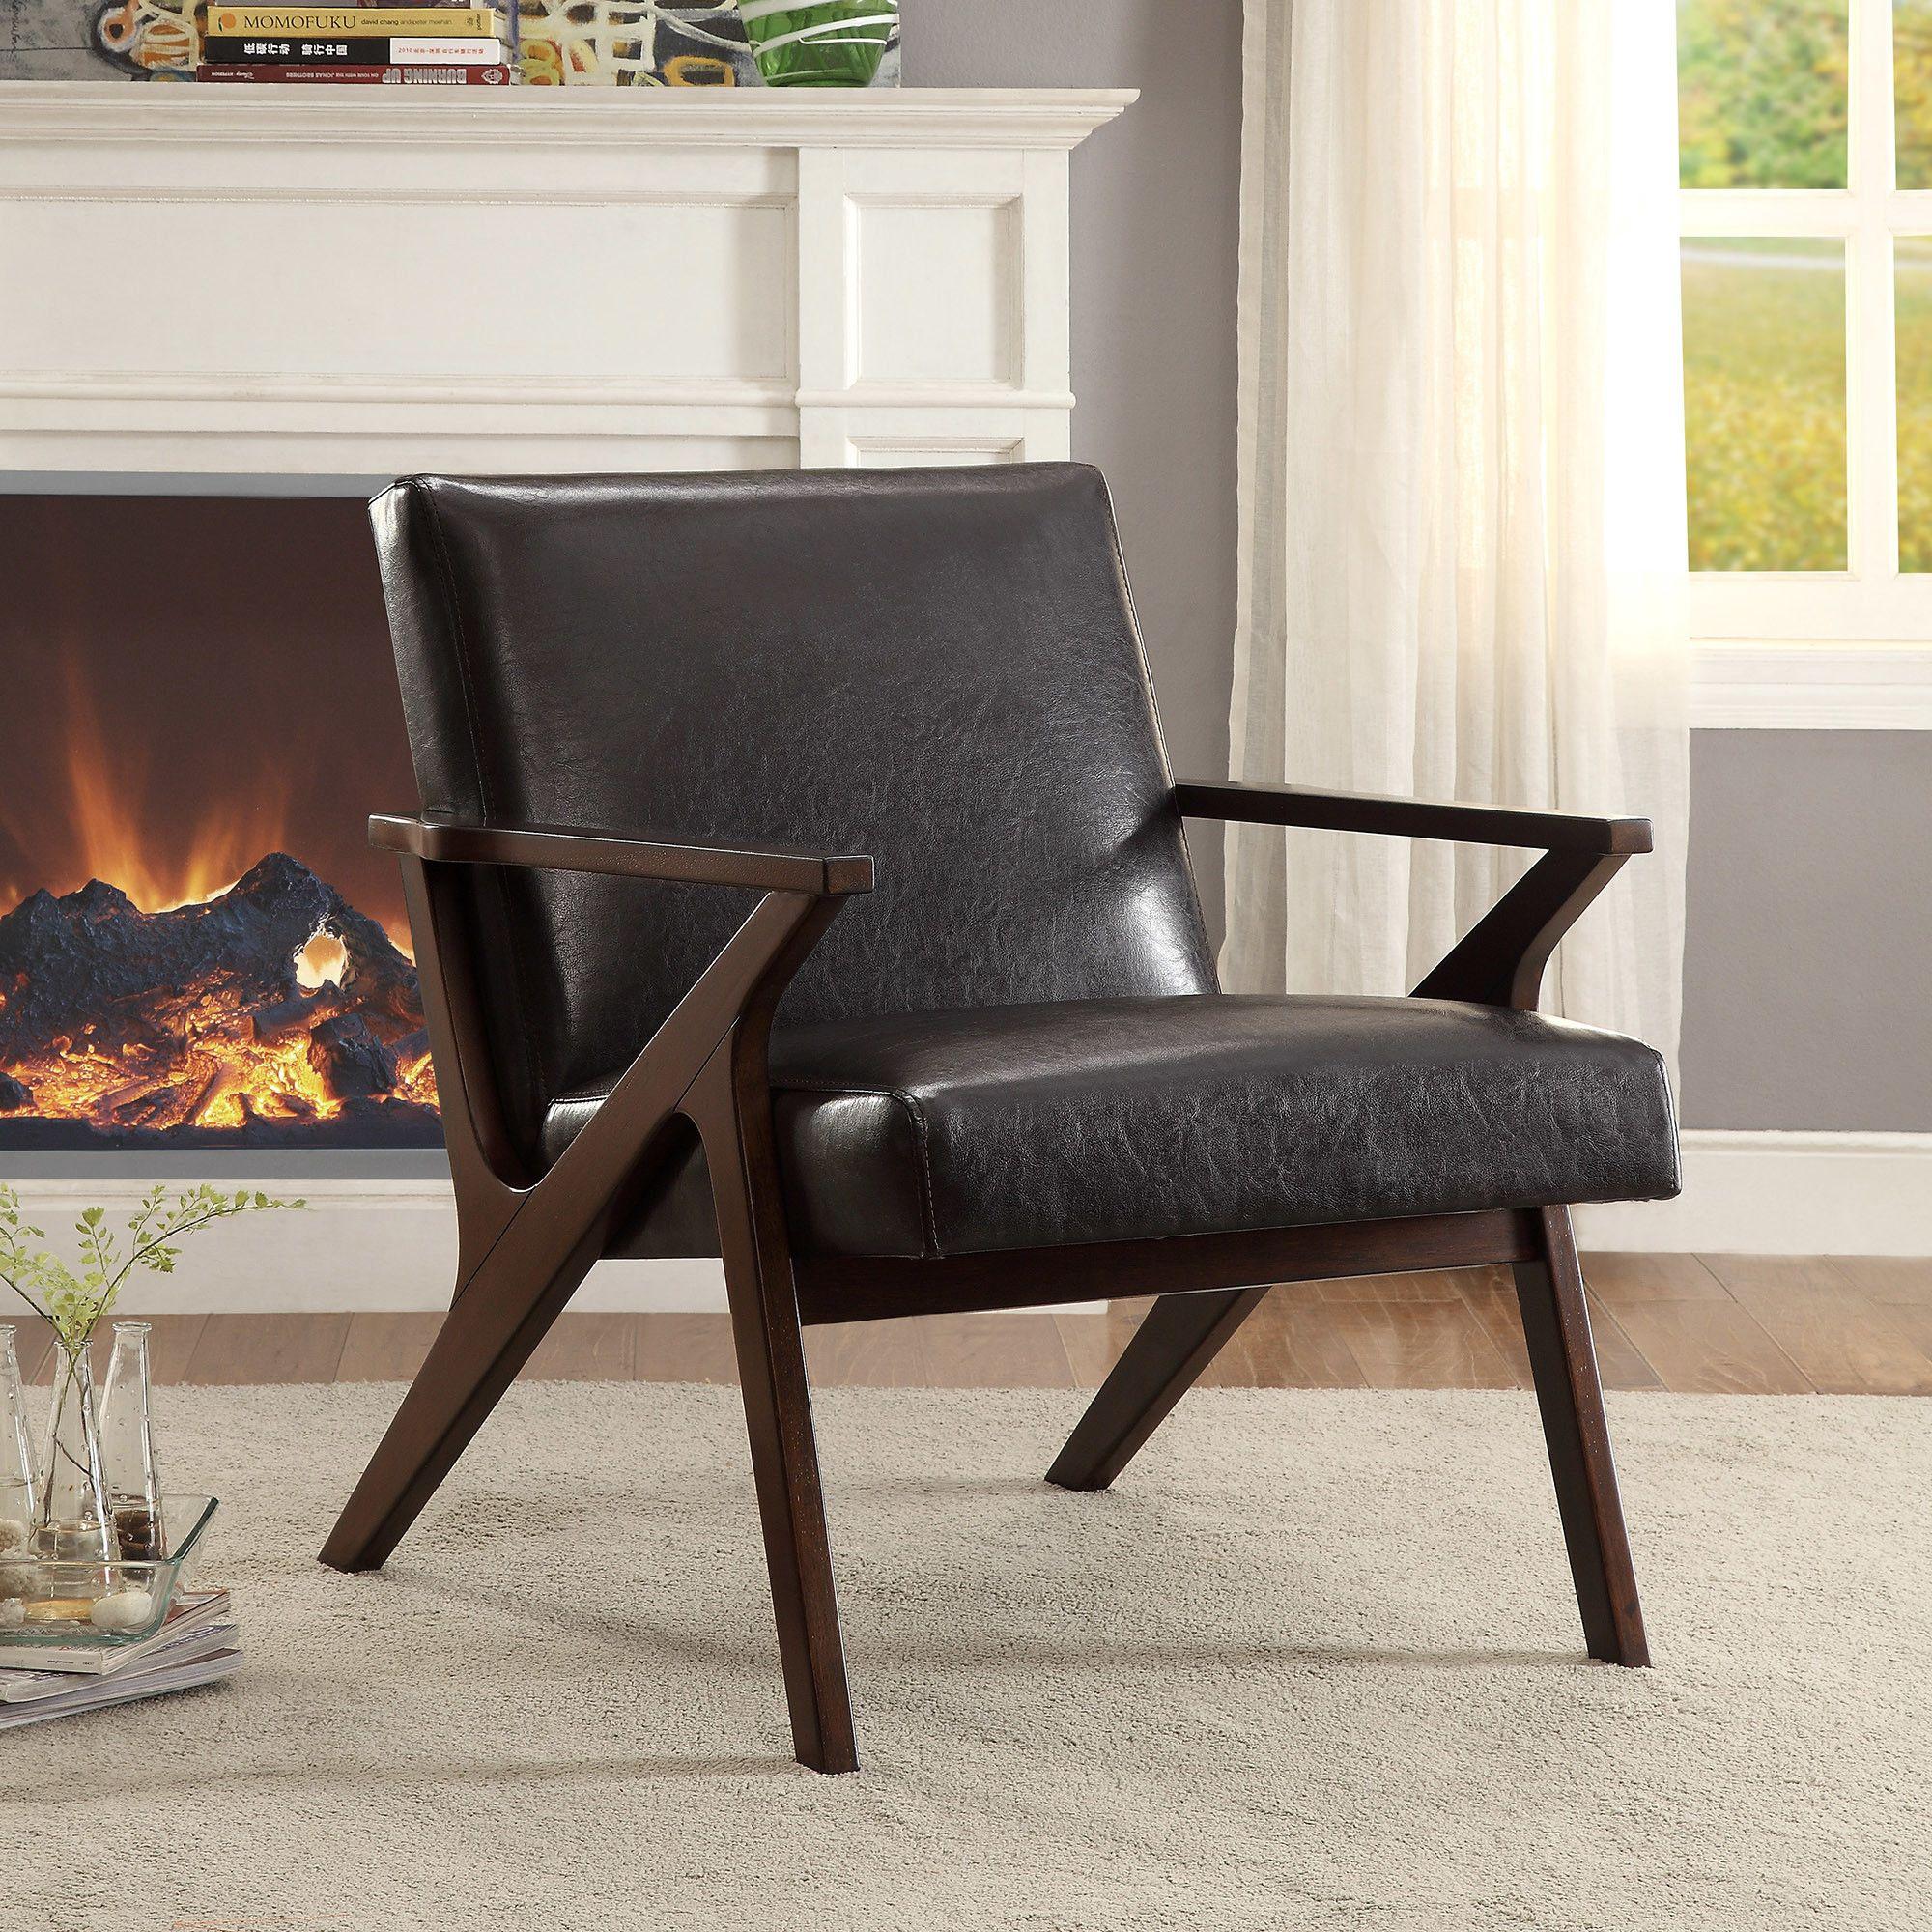 Chandler Slipper Chair Furniture, Modern furniture